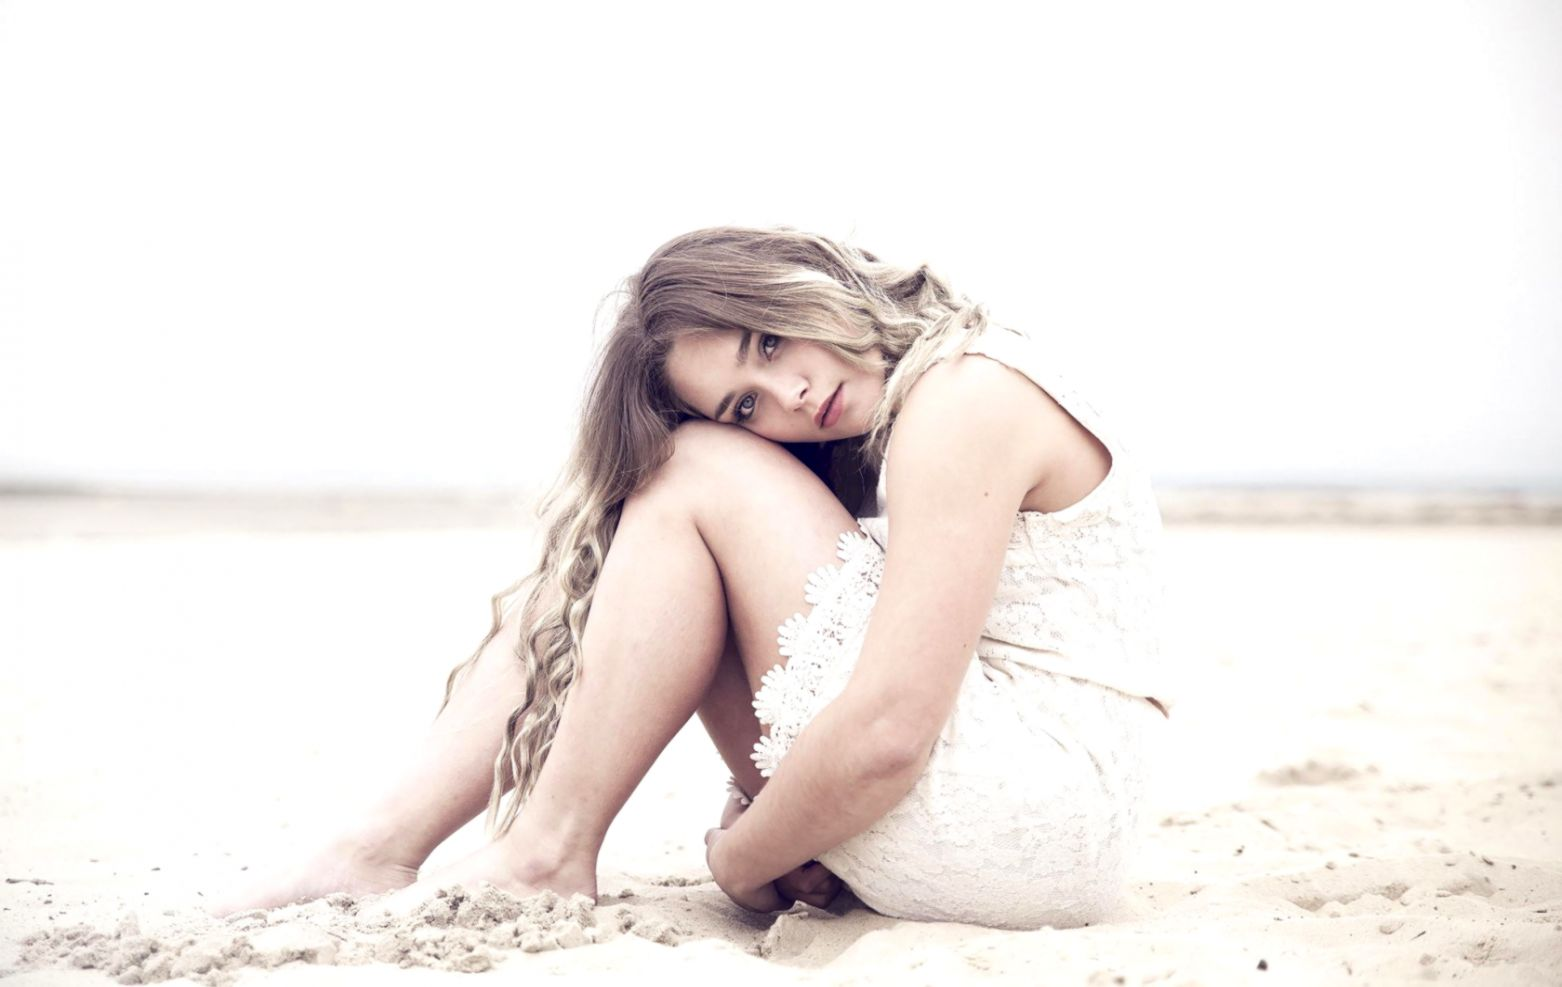 Model White Dress Girl Photo Hd Wallpaper